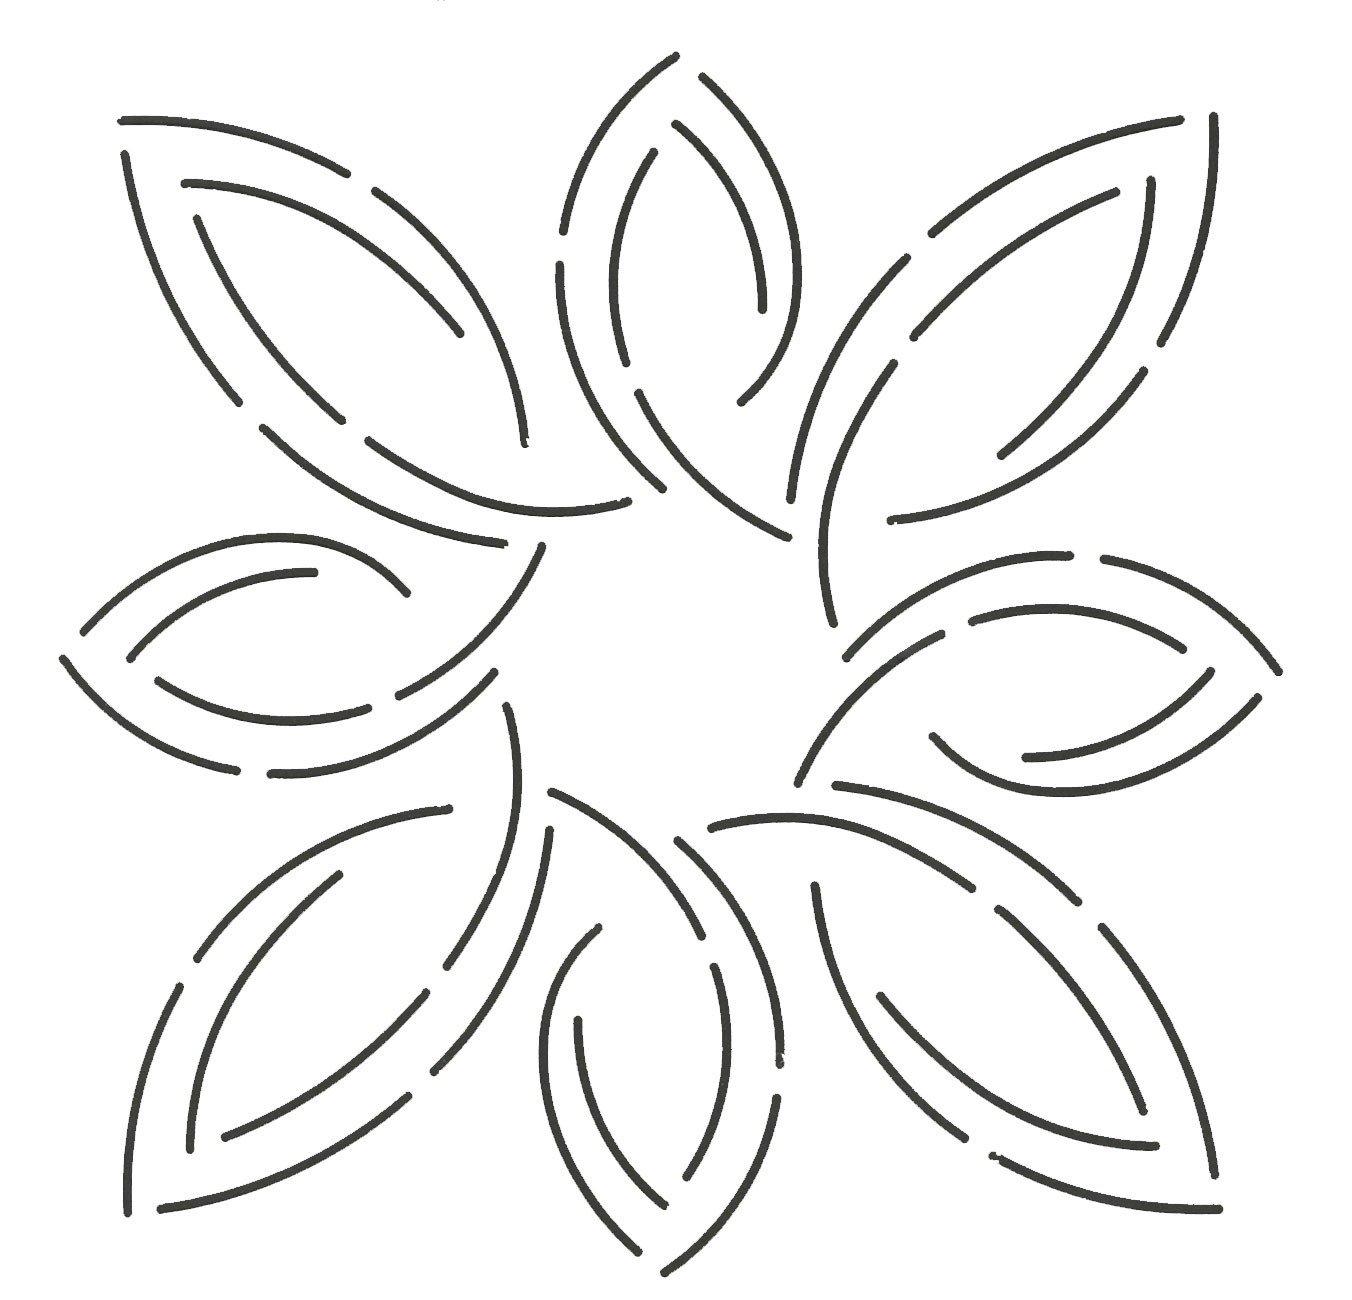 7 Quilting Creations Pear Leaf Medallion Stencil